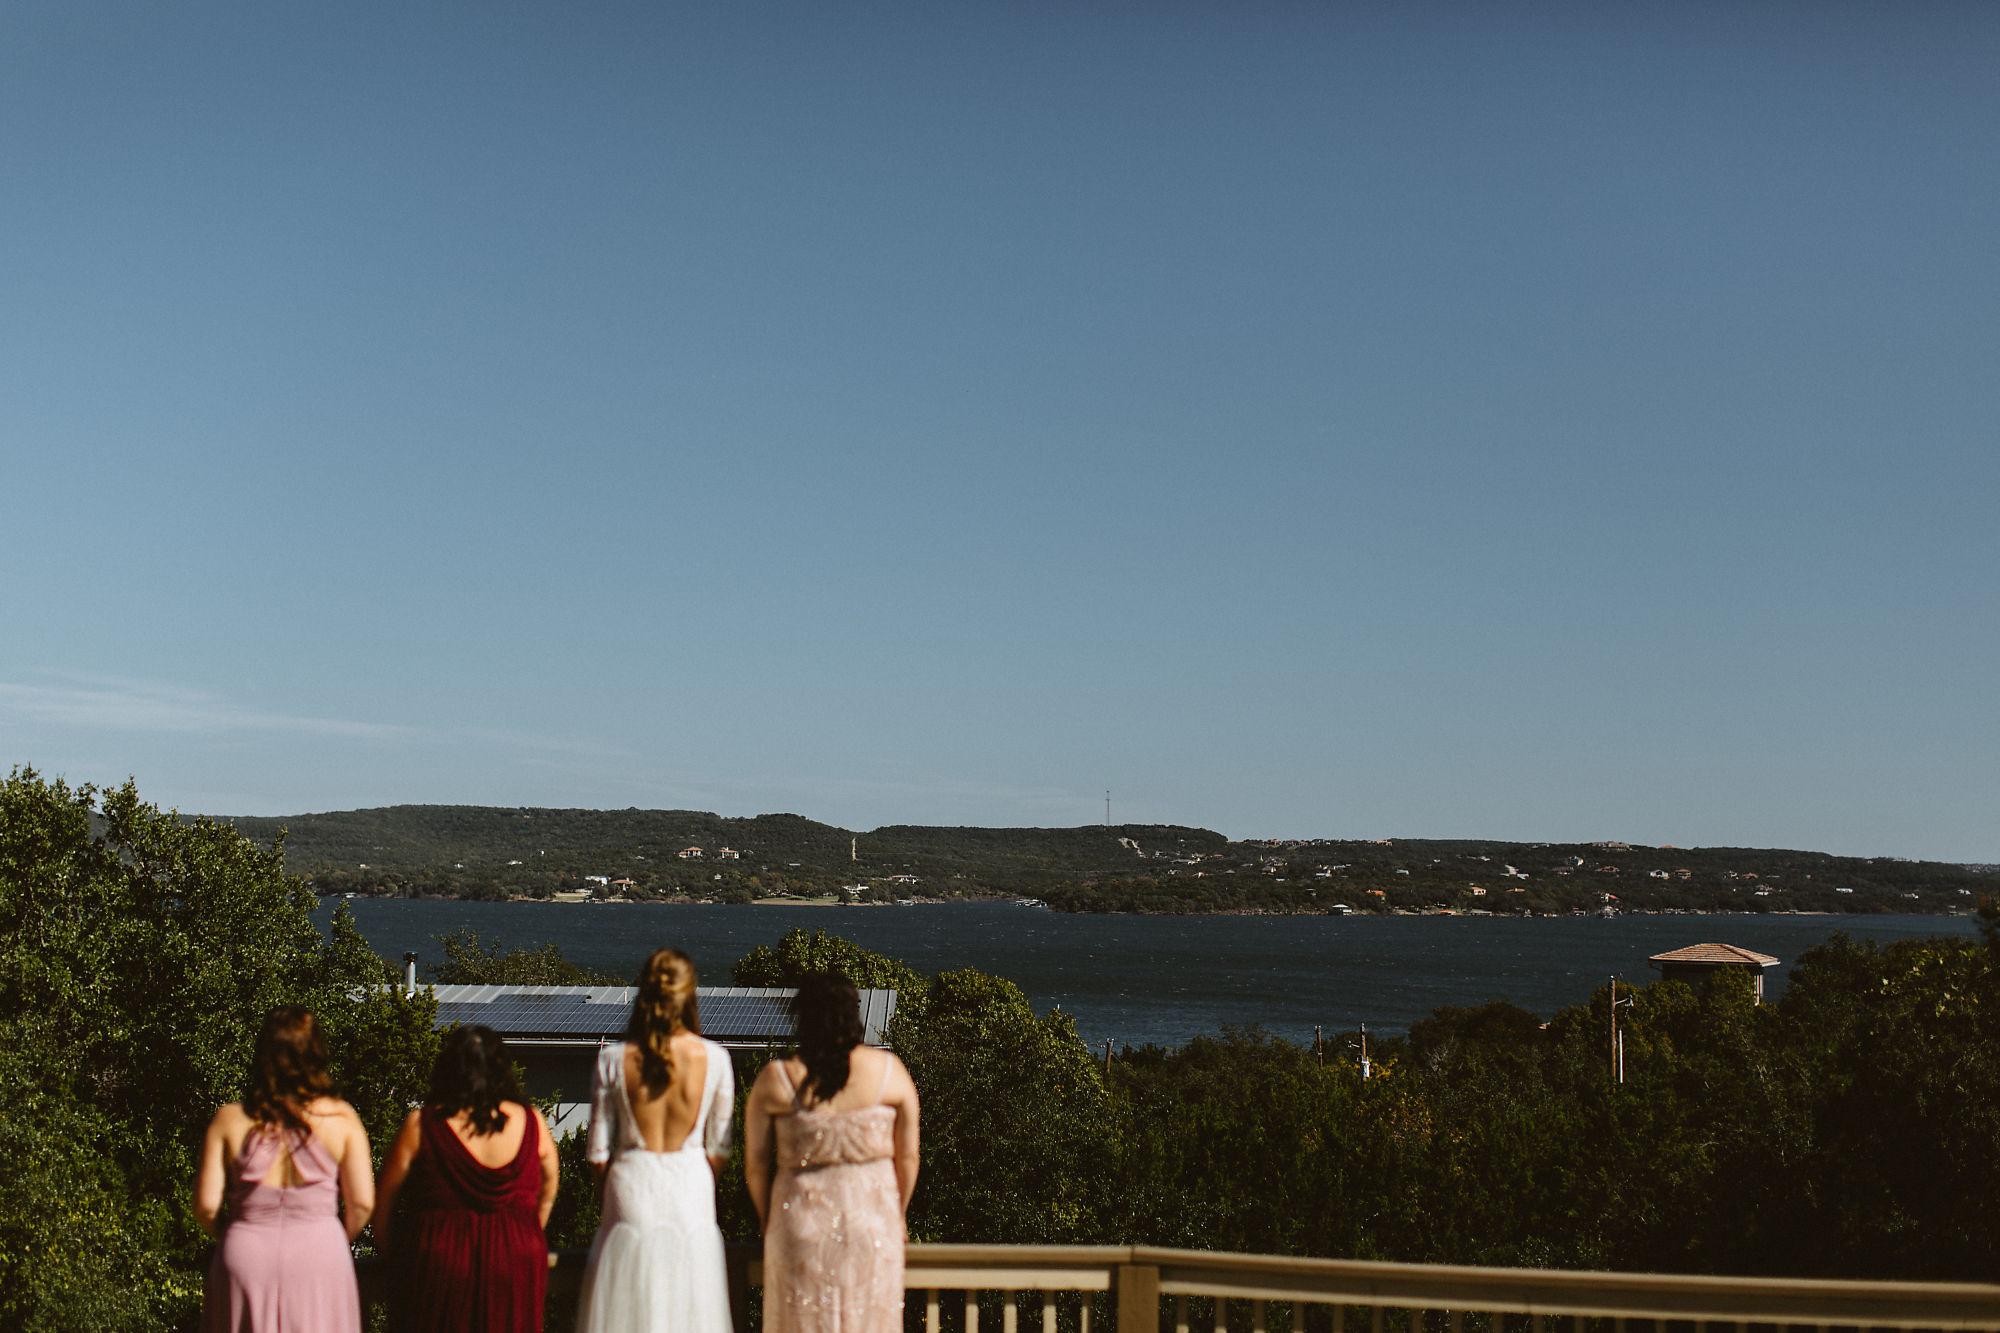 jessica_austin_oasis_brewery_wedding_photos114524.jpg